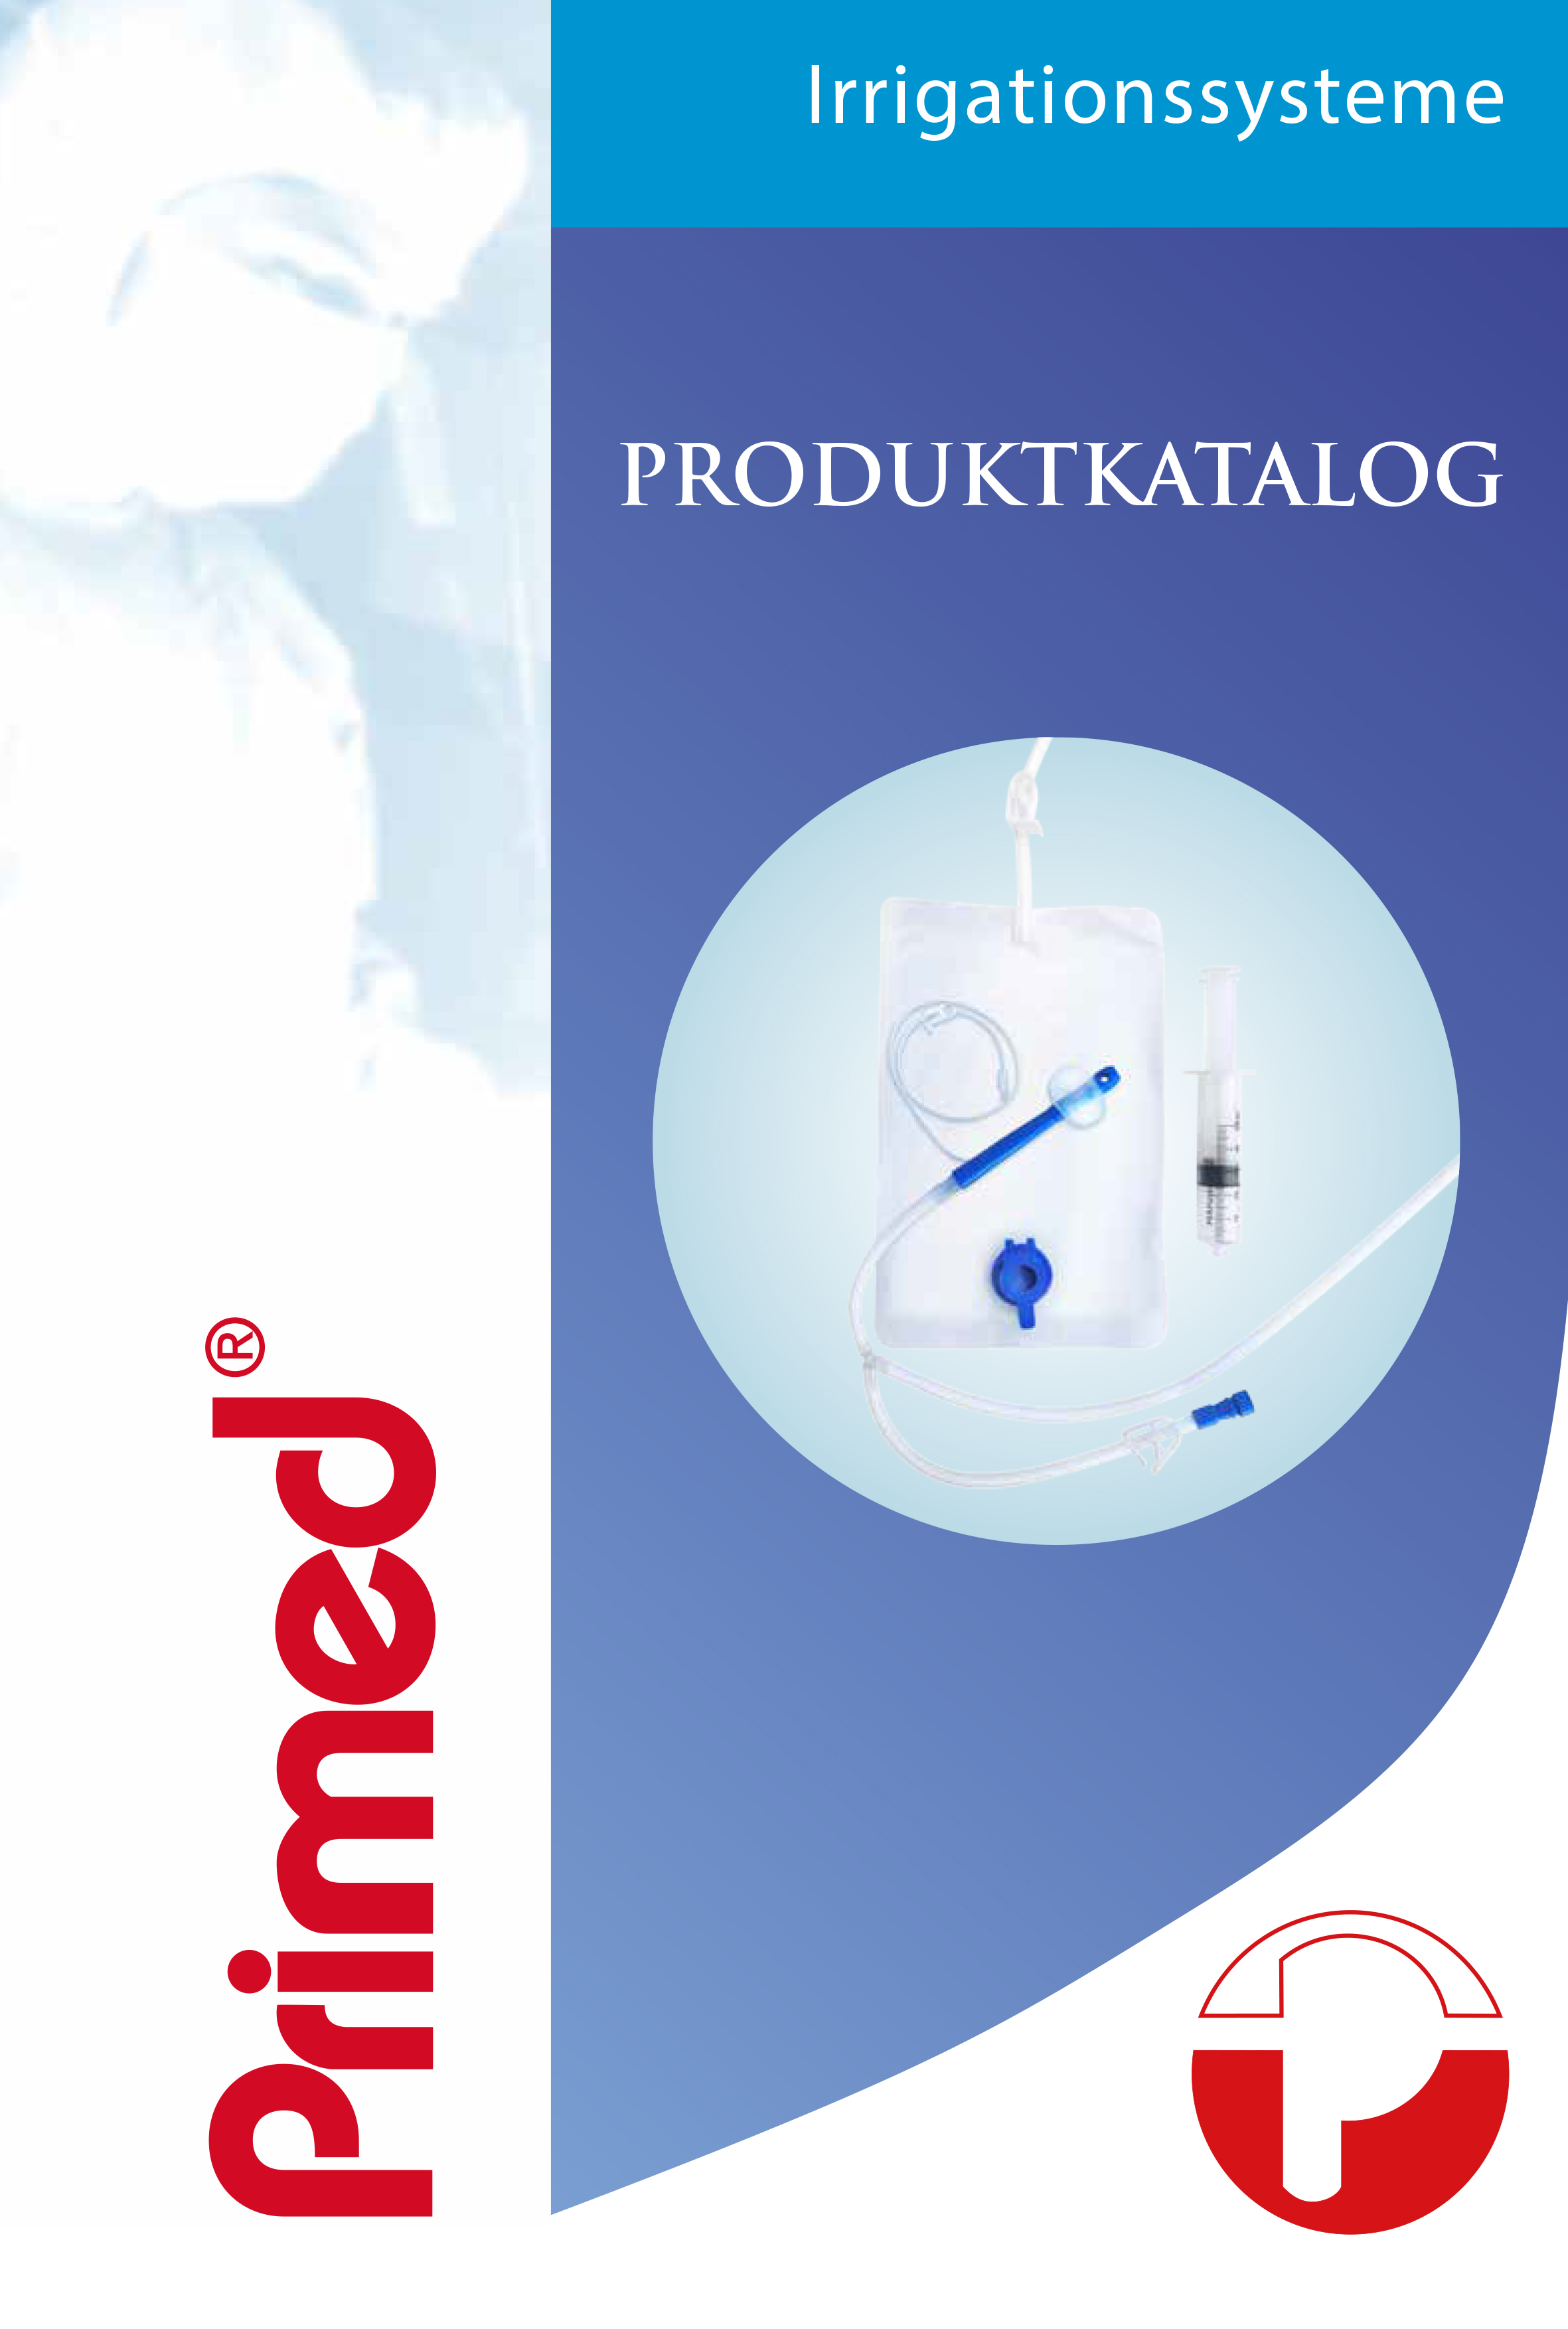 Irrigationssysteme_Katalog_DE_Frontbild